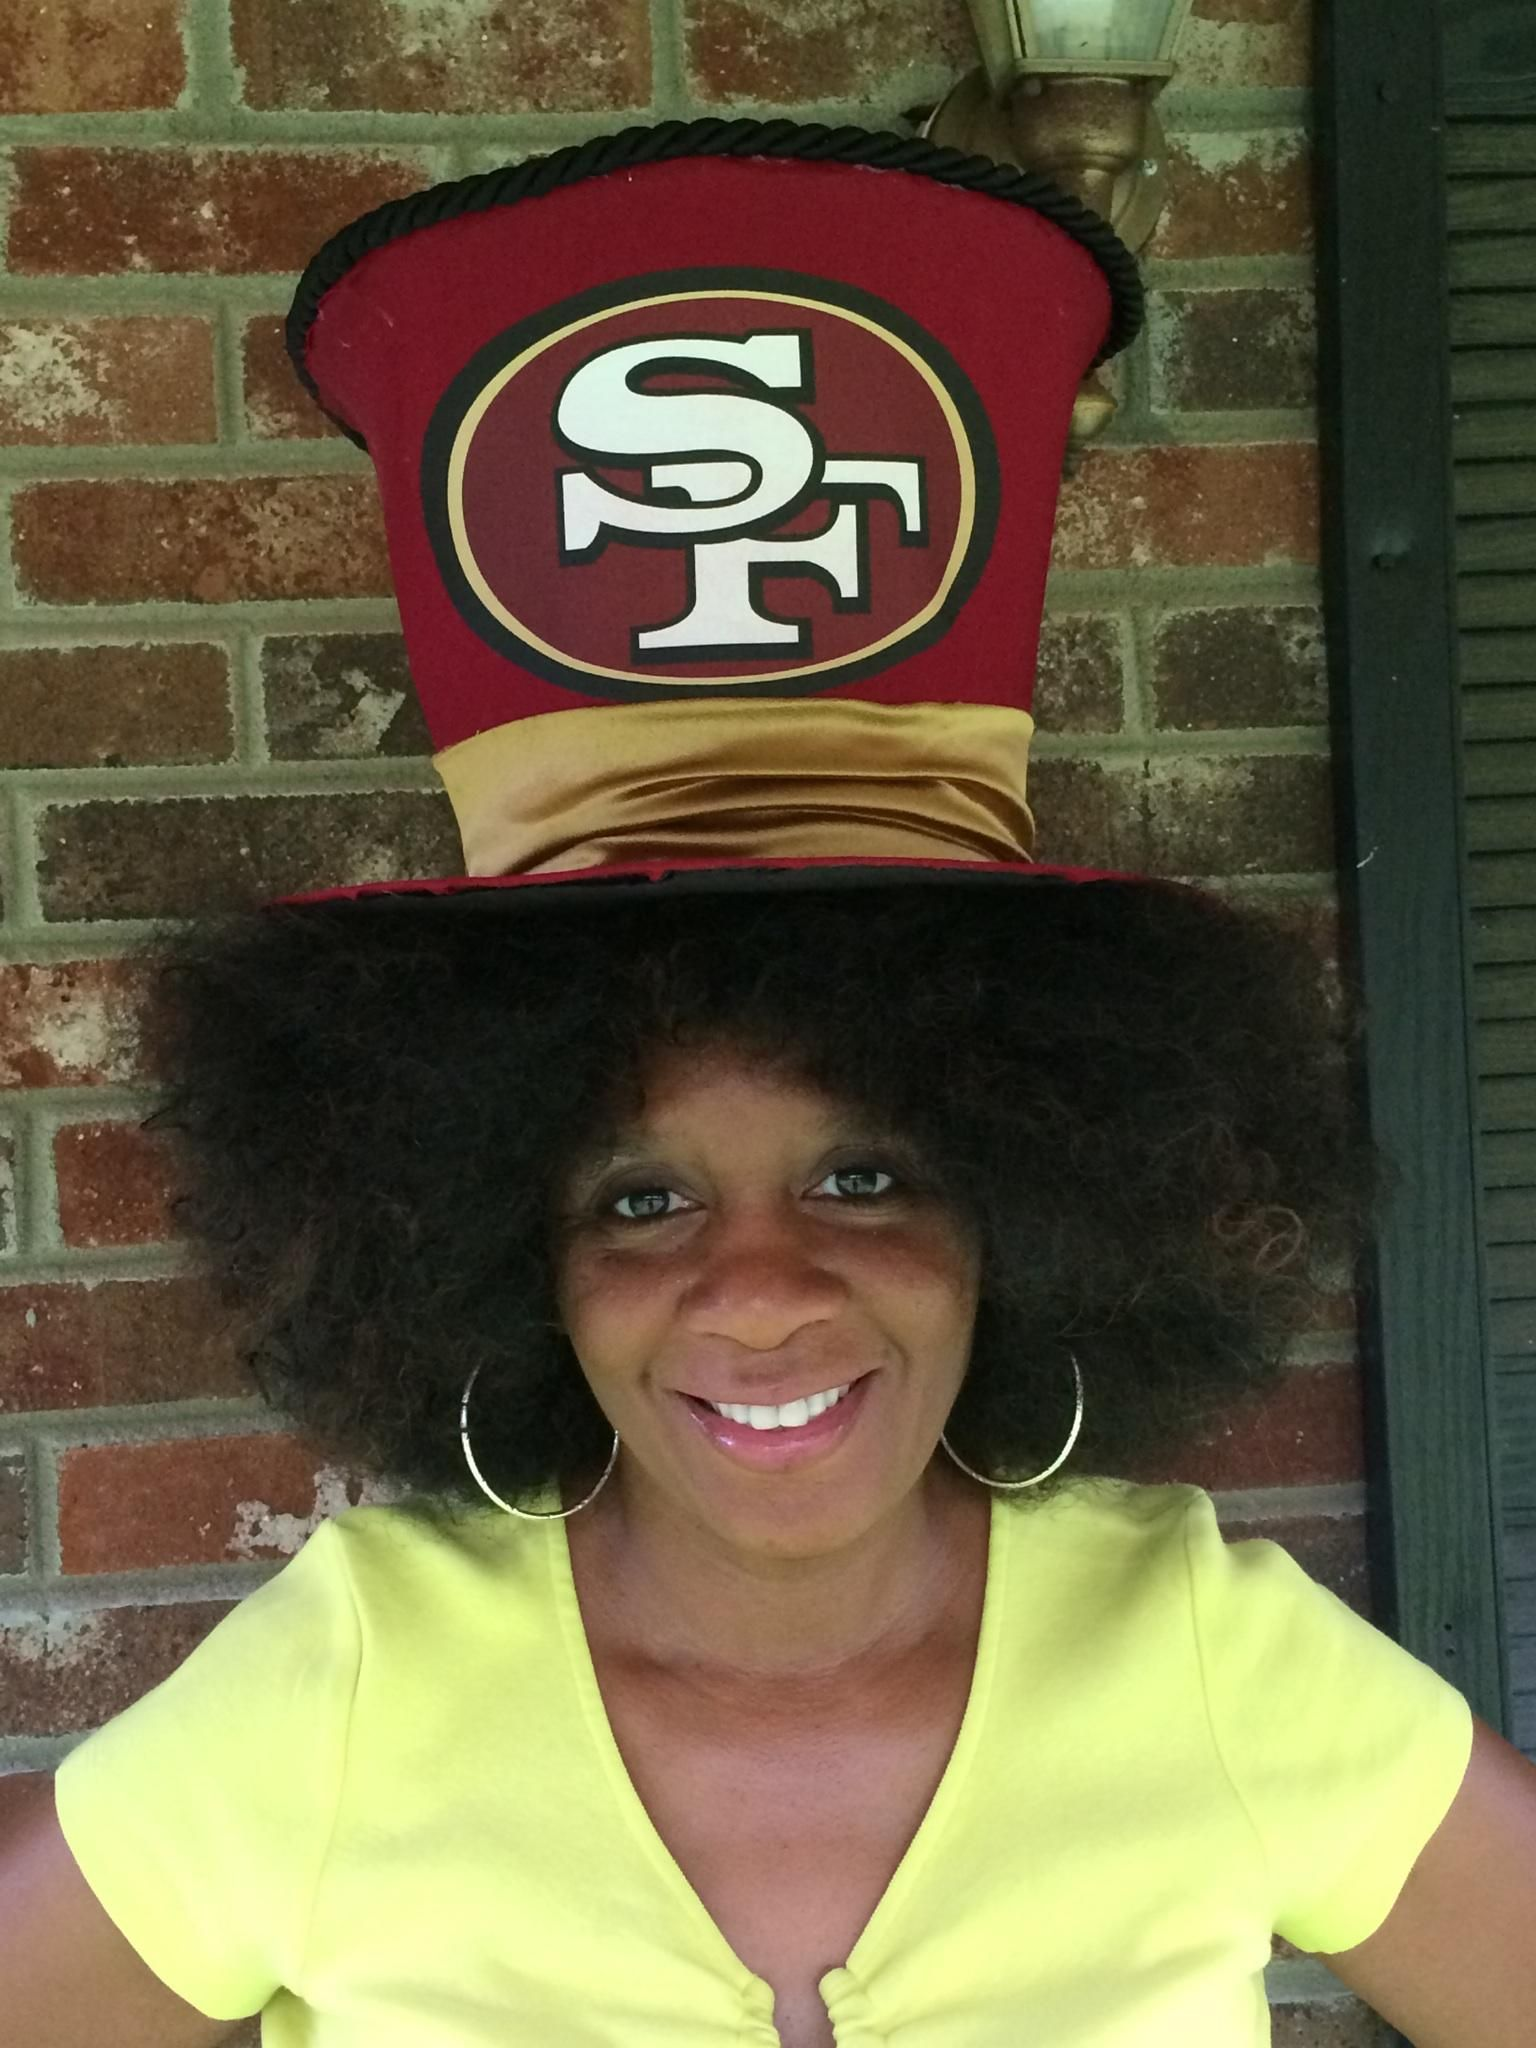 Calling All 49ers Fans Top Hats Hats 49ers Fans